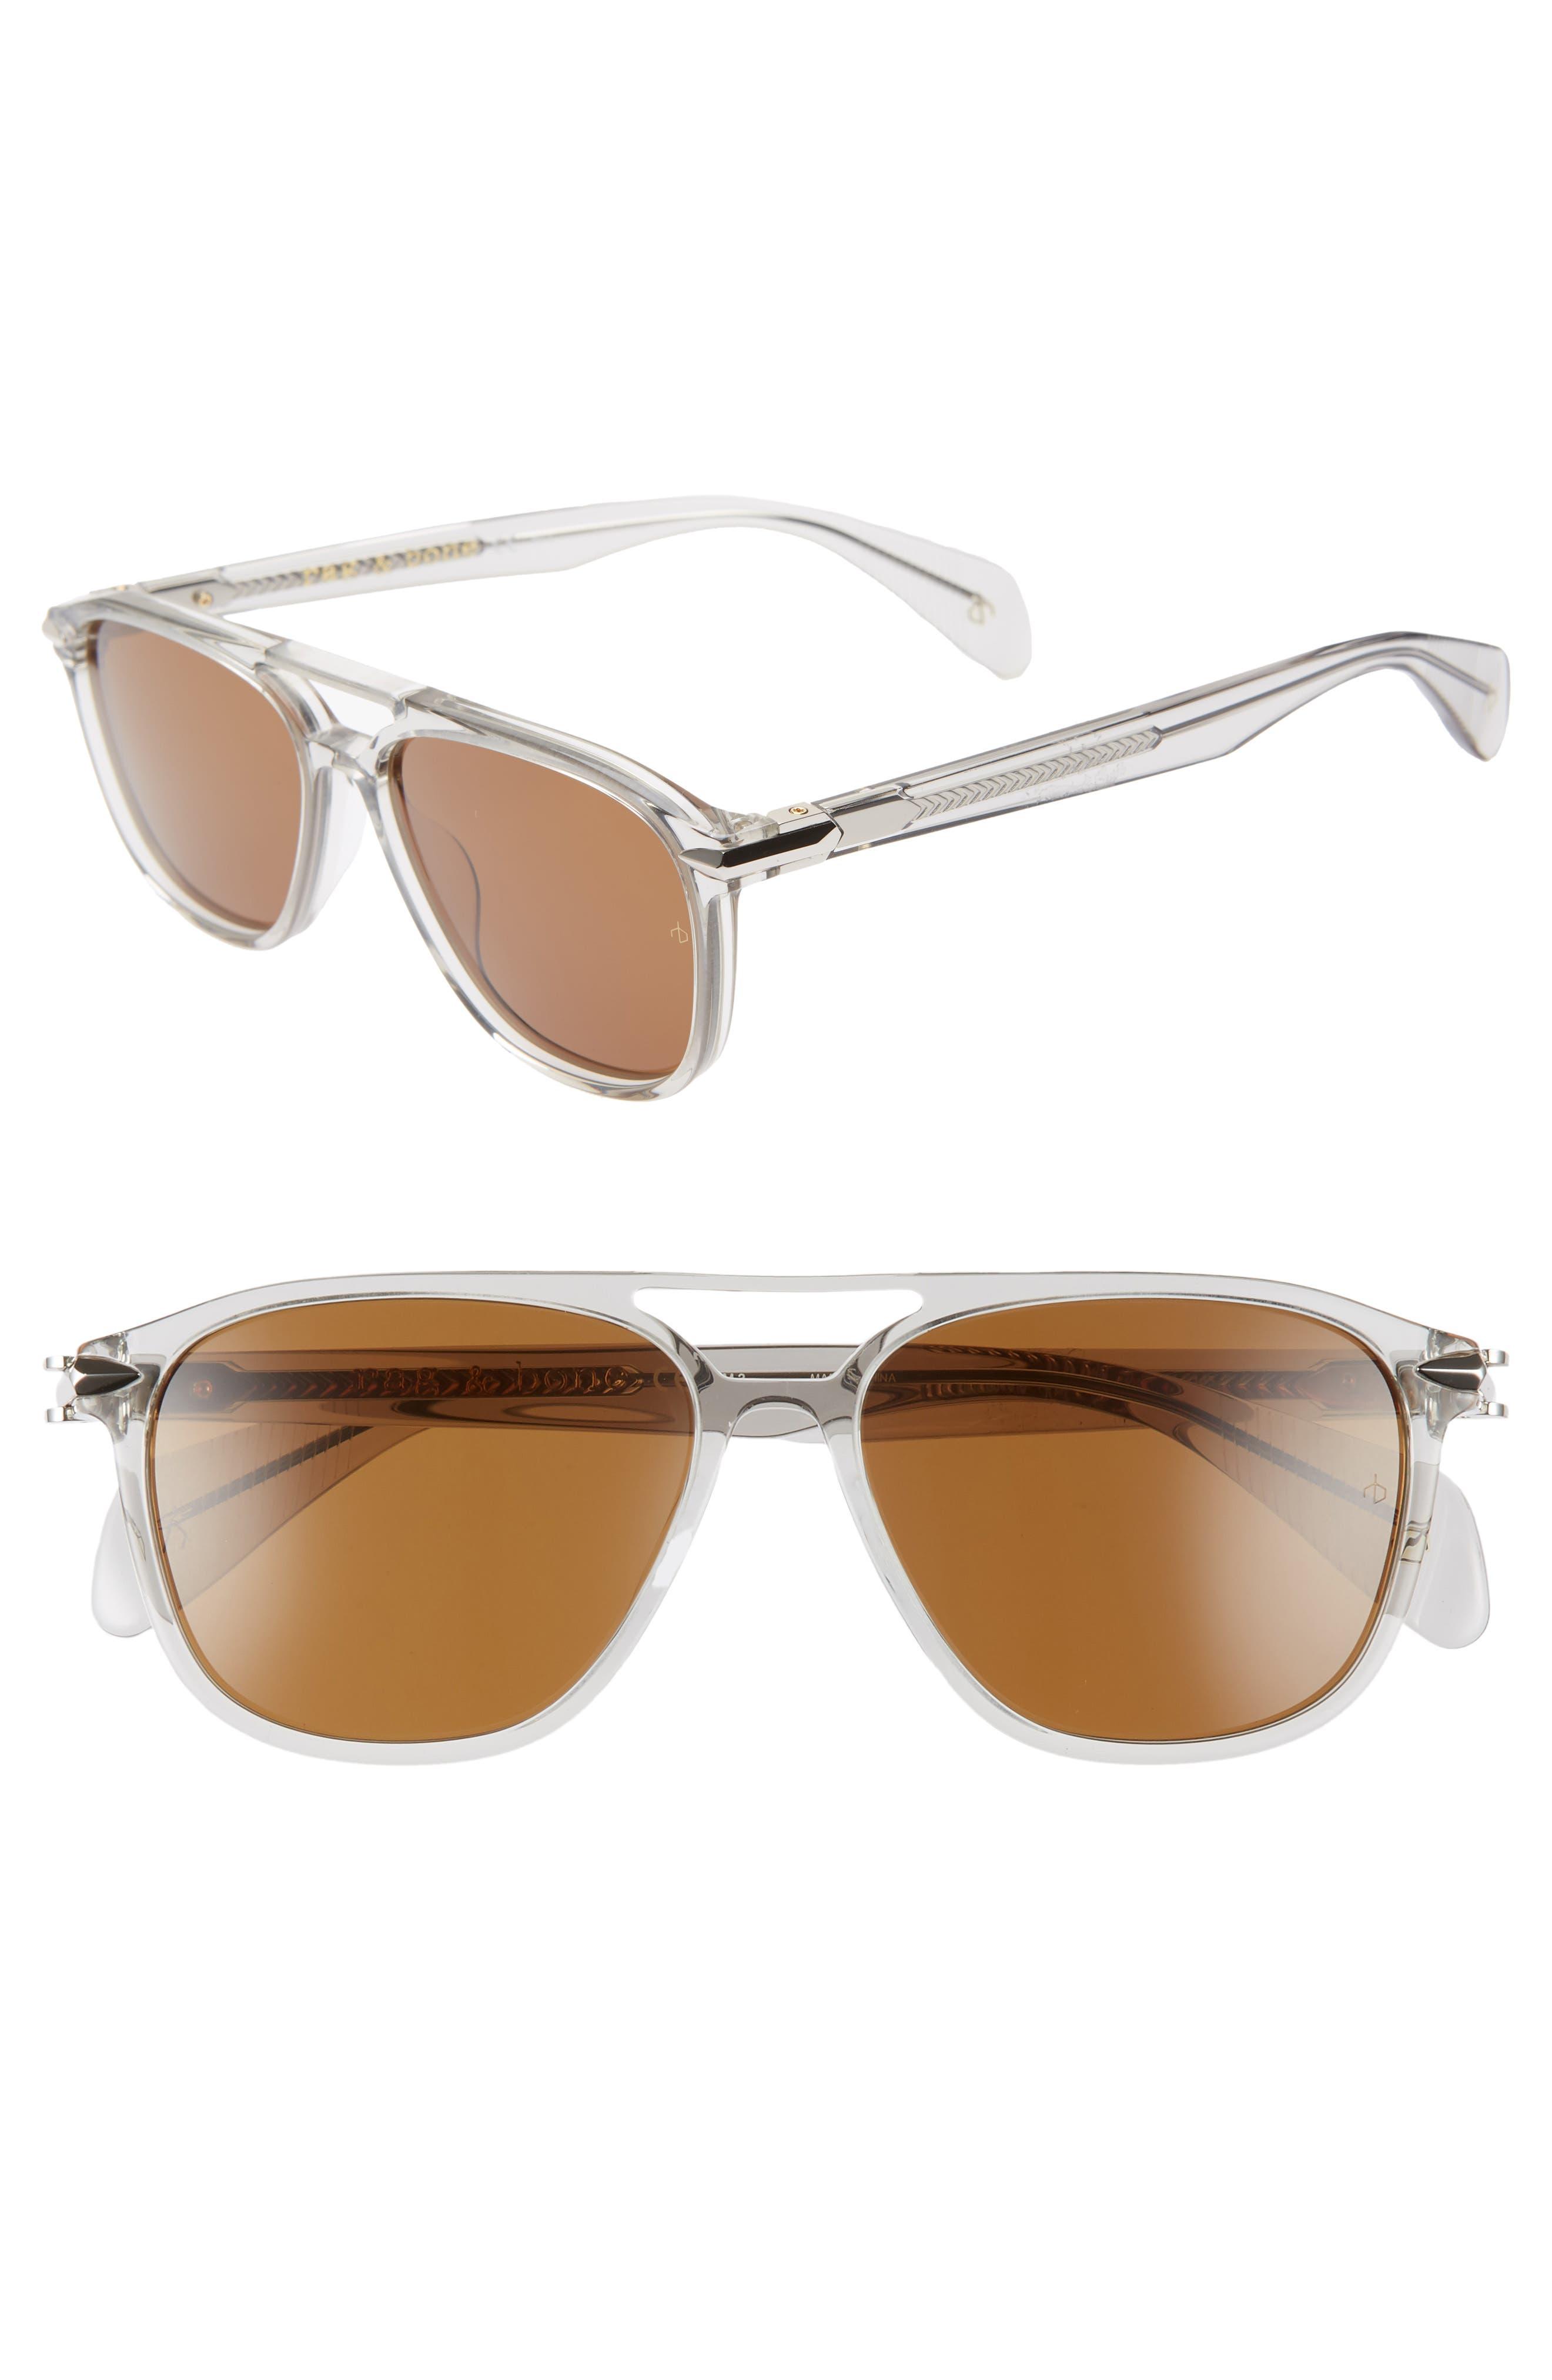 54mm Aviator Sunglasses,                             Main thumbnail 1, color,                             GREY